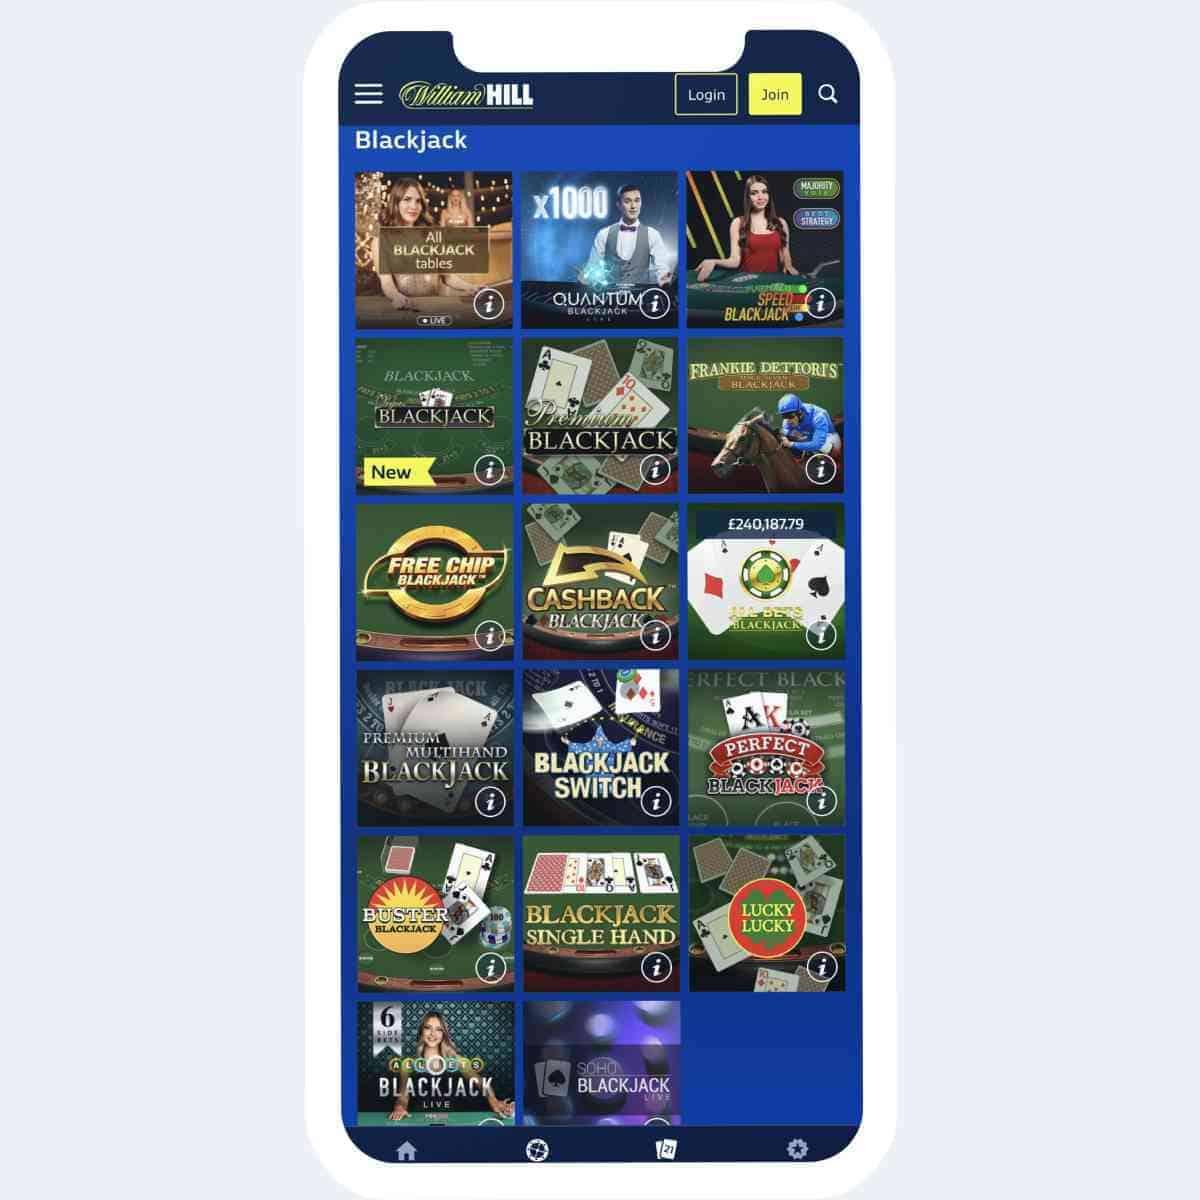 William Hill live games mobile